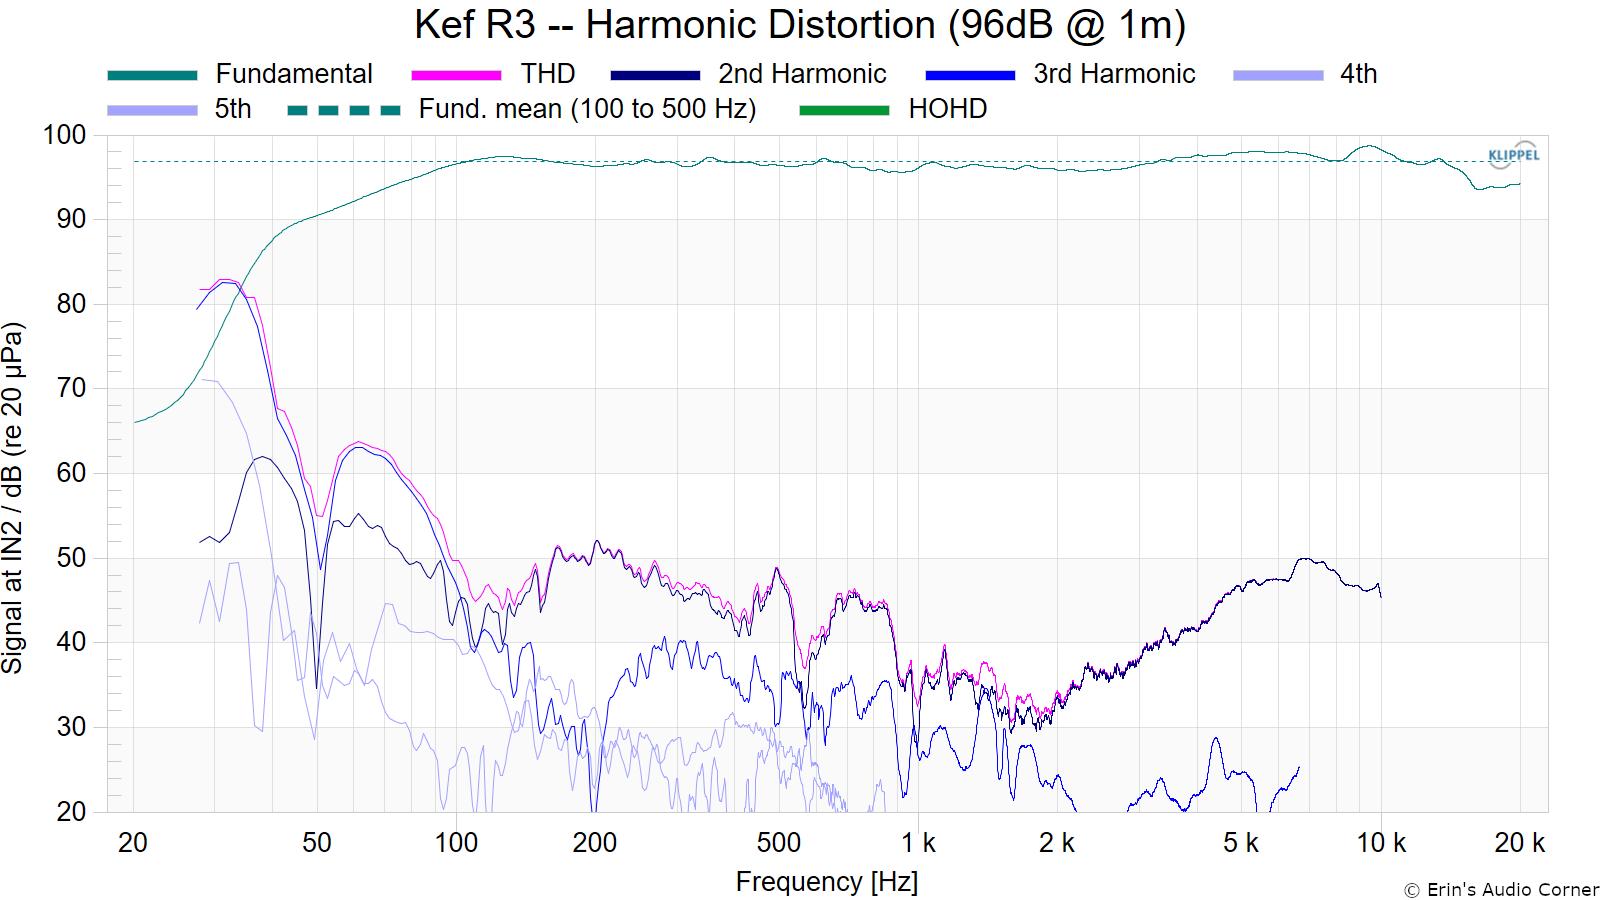 Kef R3 -- Harmonic Distortion (96dB @ 1m)_fundamental.png